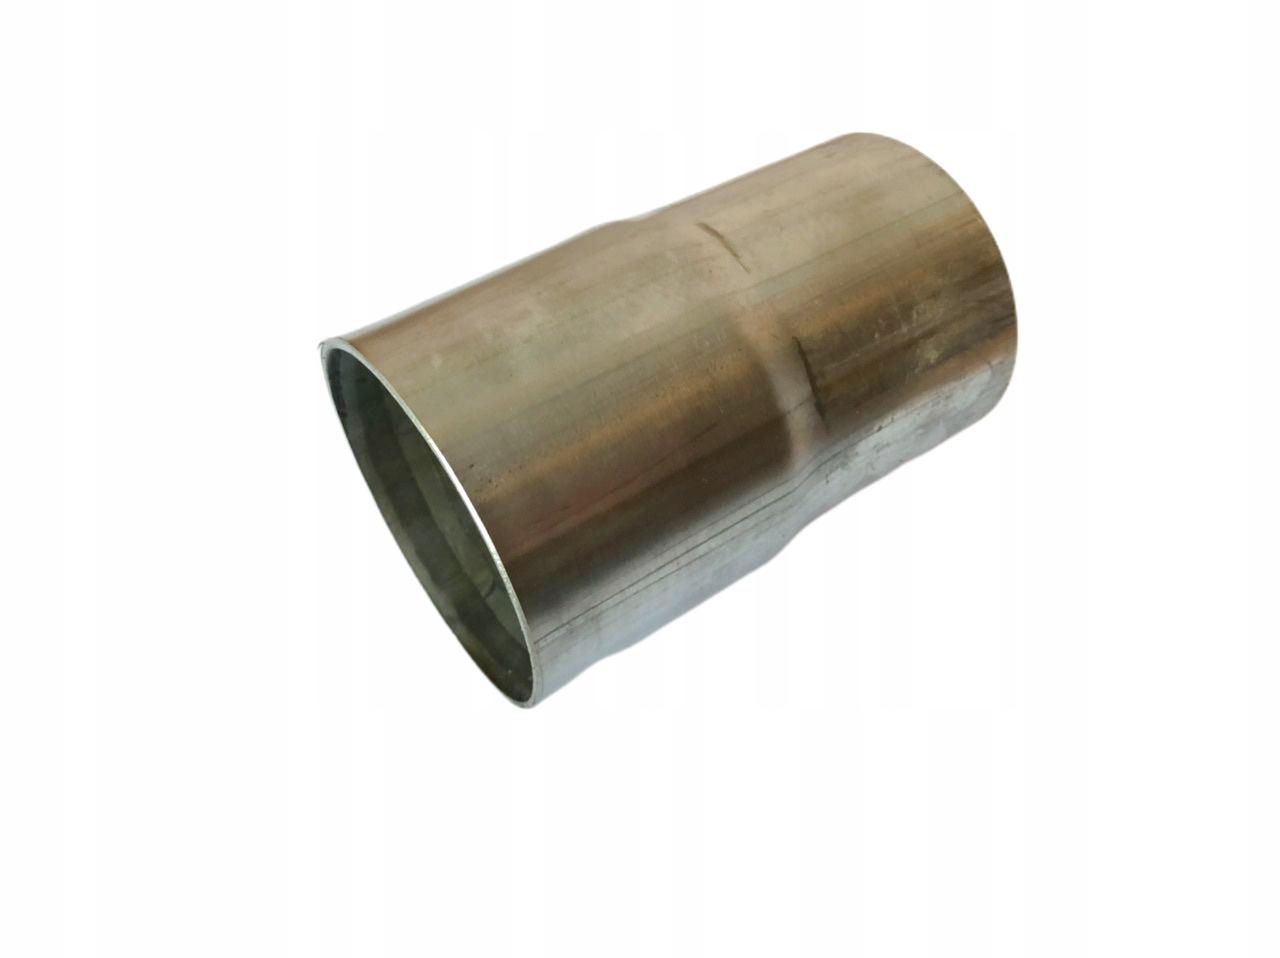 уменьшение заколка roztłoczenie сталь 606366